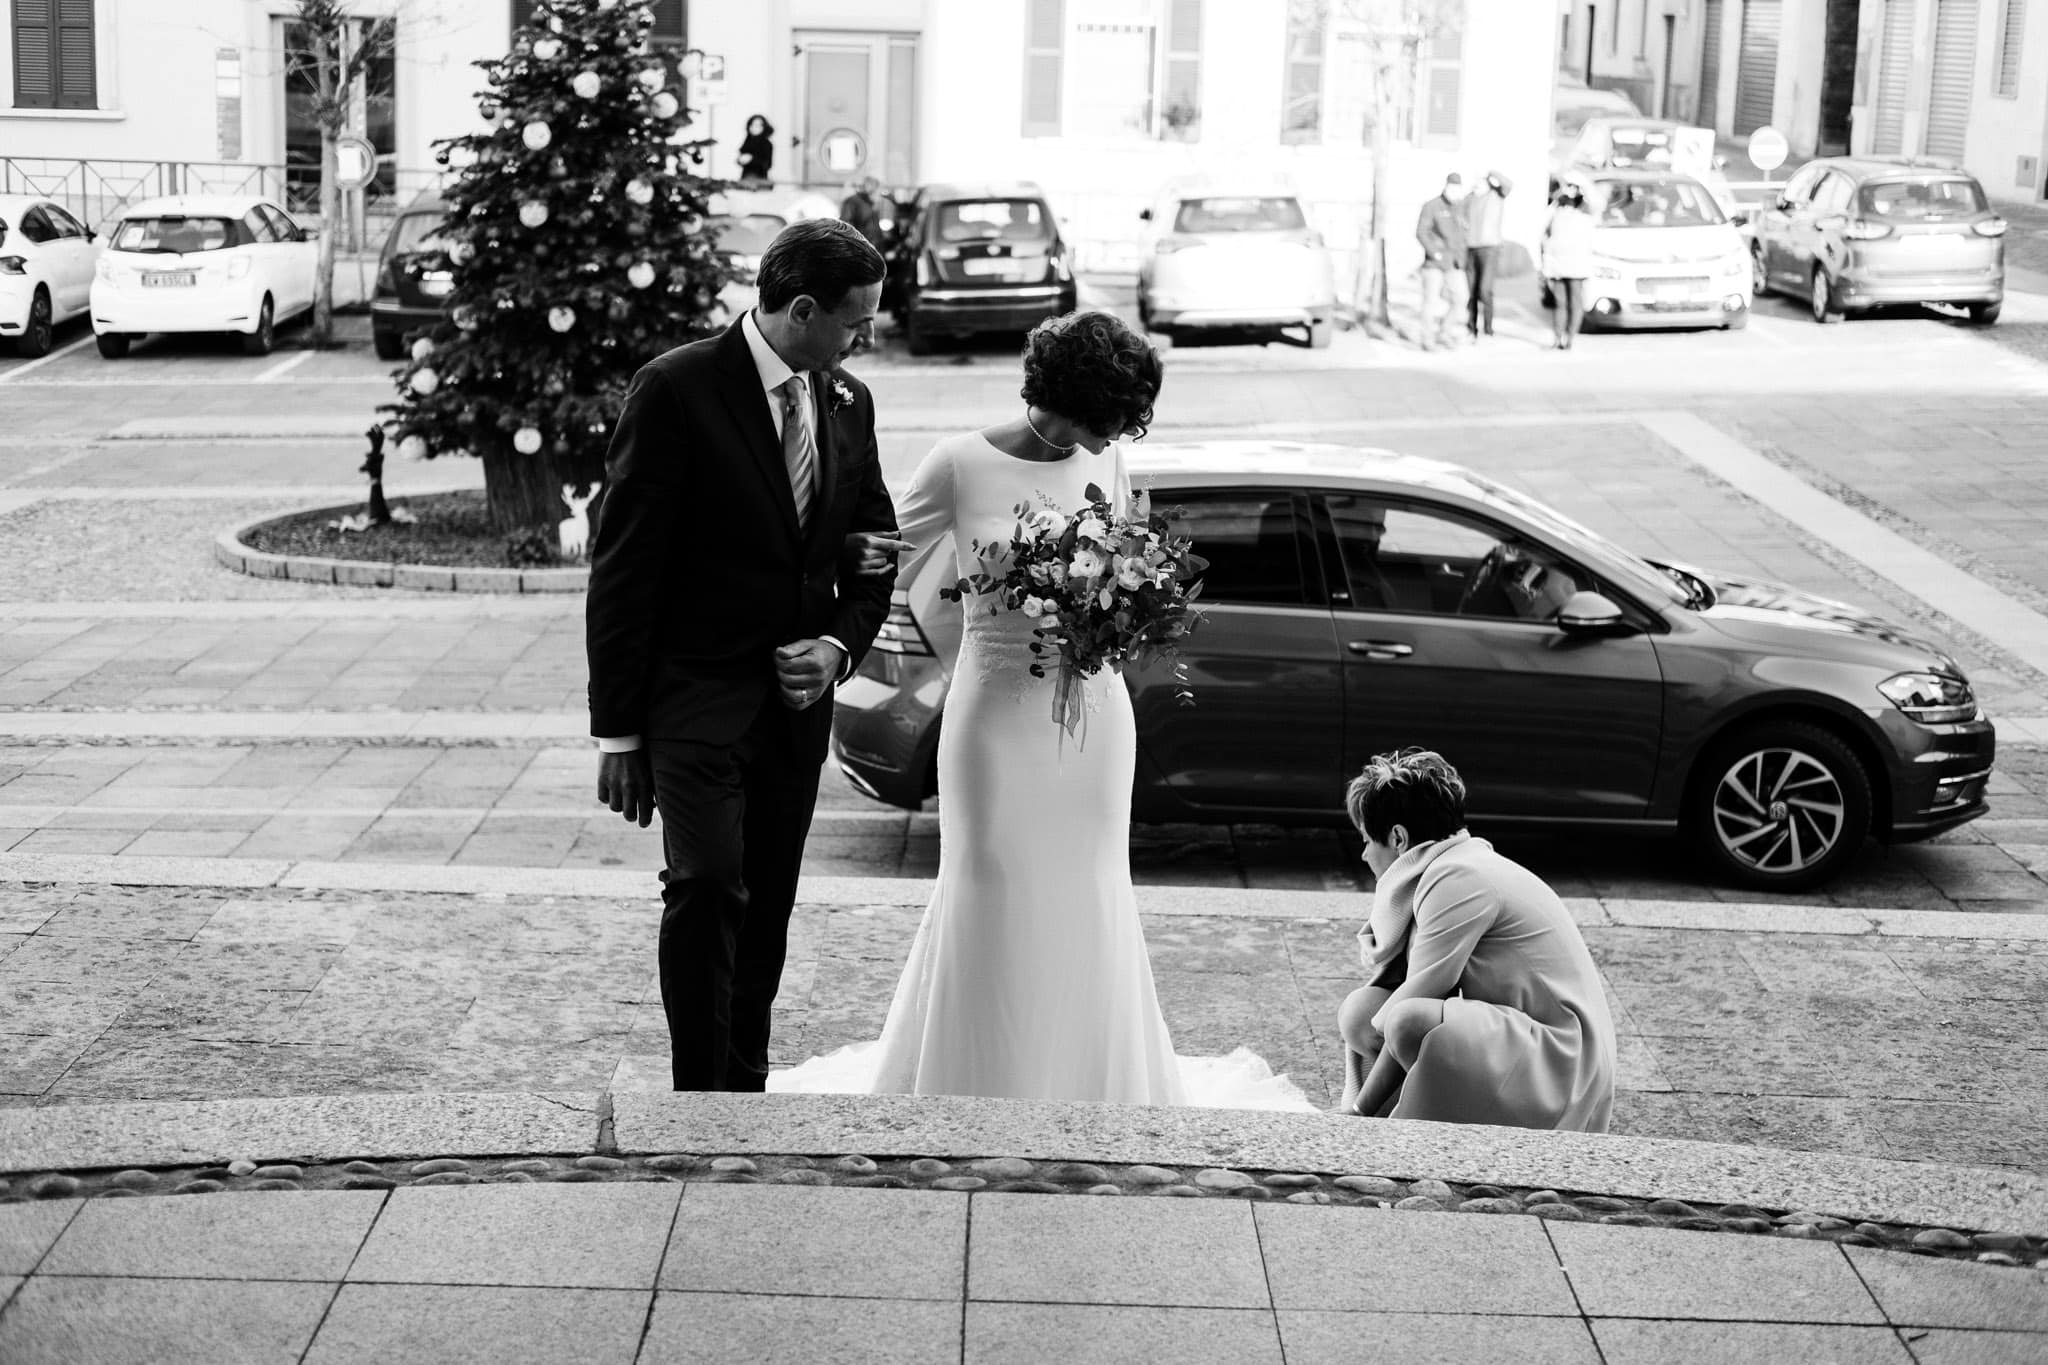 bellezza sposa in chiesa